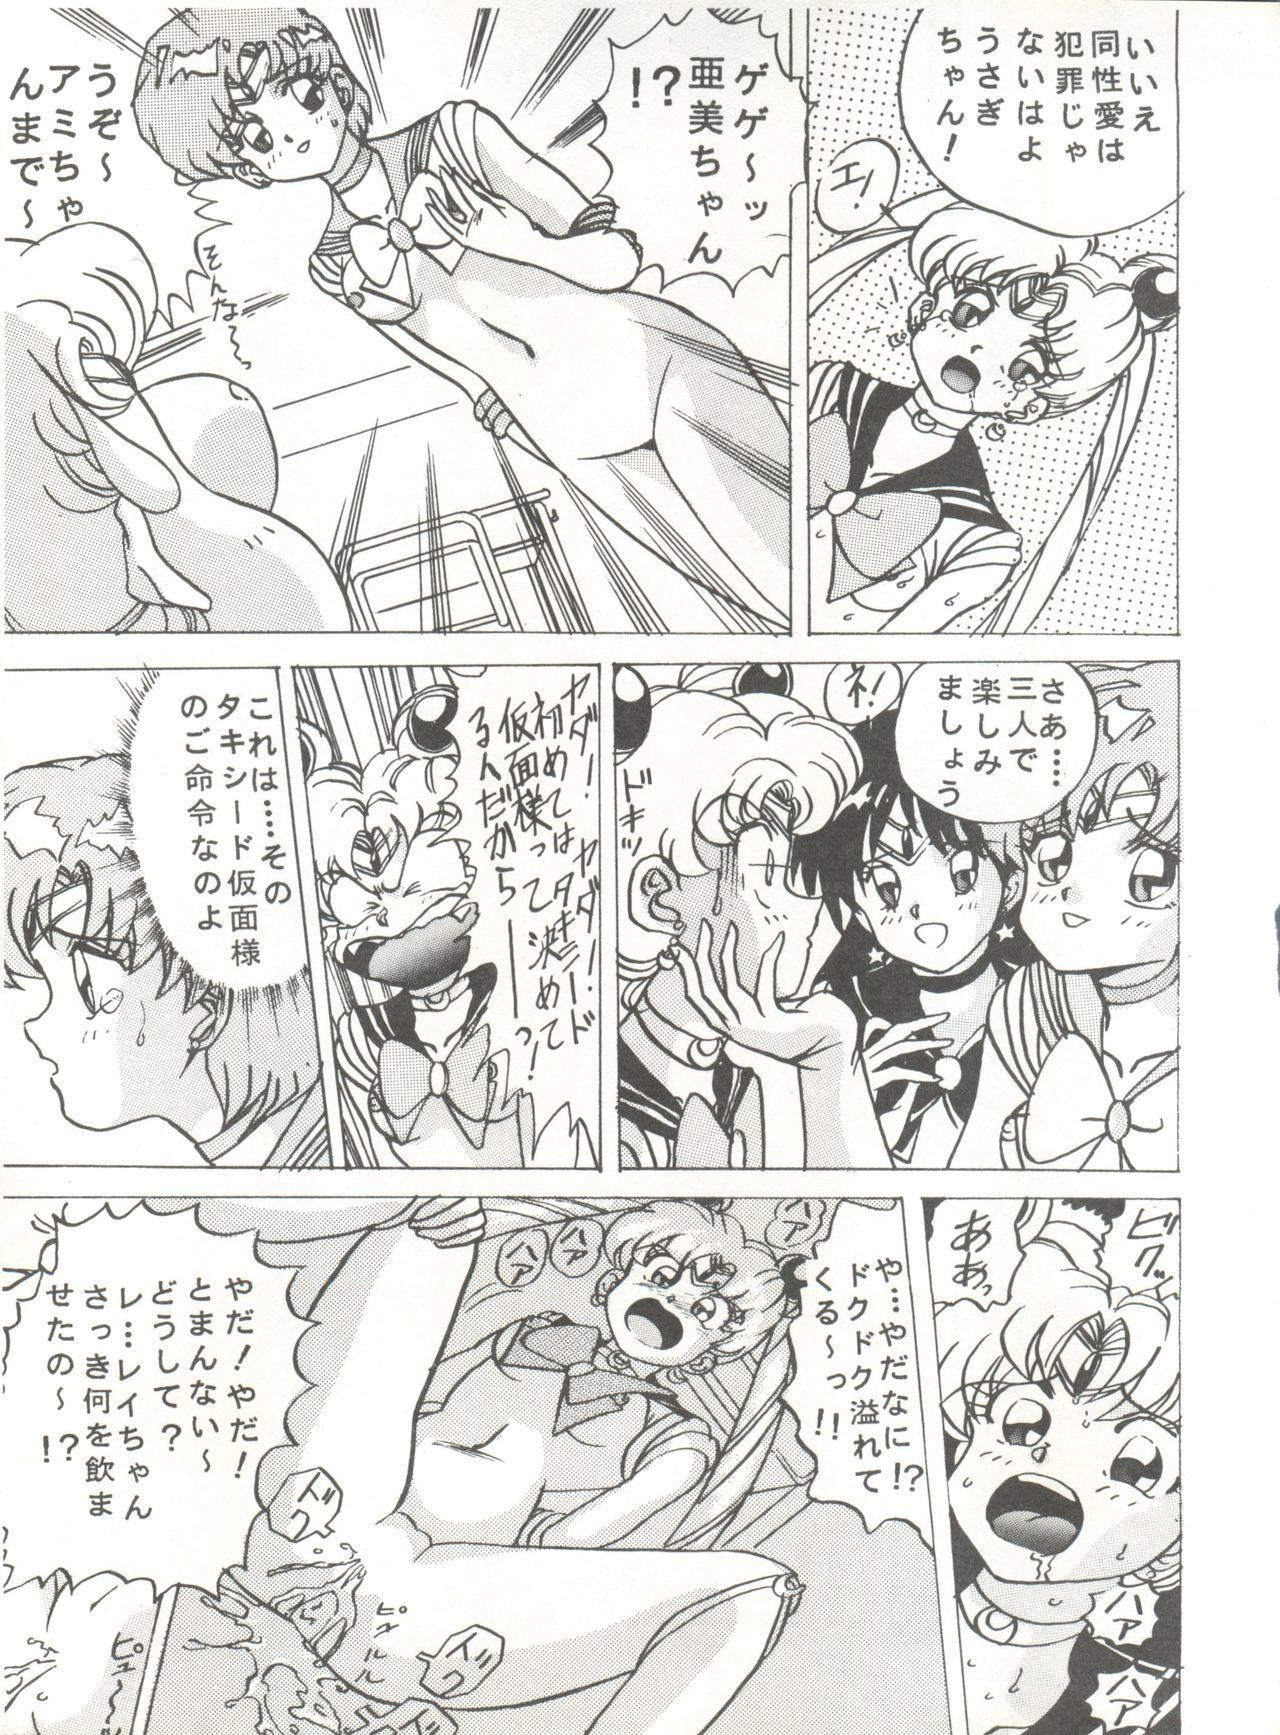 [Global One (MARO)] Sadistic 5 (Cutey Honey, Devilman, Sailor Moon), [Global One (MARO)] Sadistic (Dirty Pair, Fushigi no Umi no Nadia, Sailor Moon), [Studio Ikkatsumajin] .ribbon (Hime-chan's Ribbon) 48